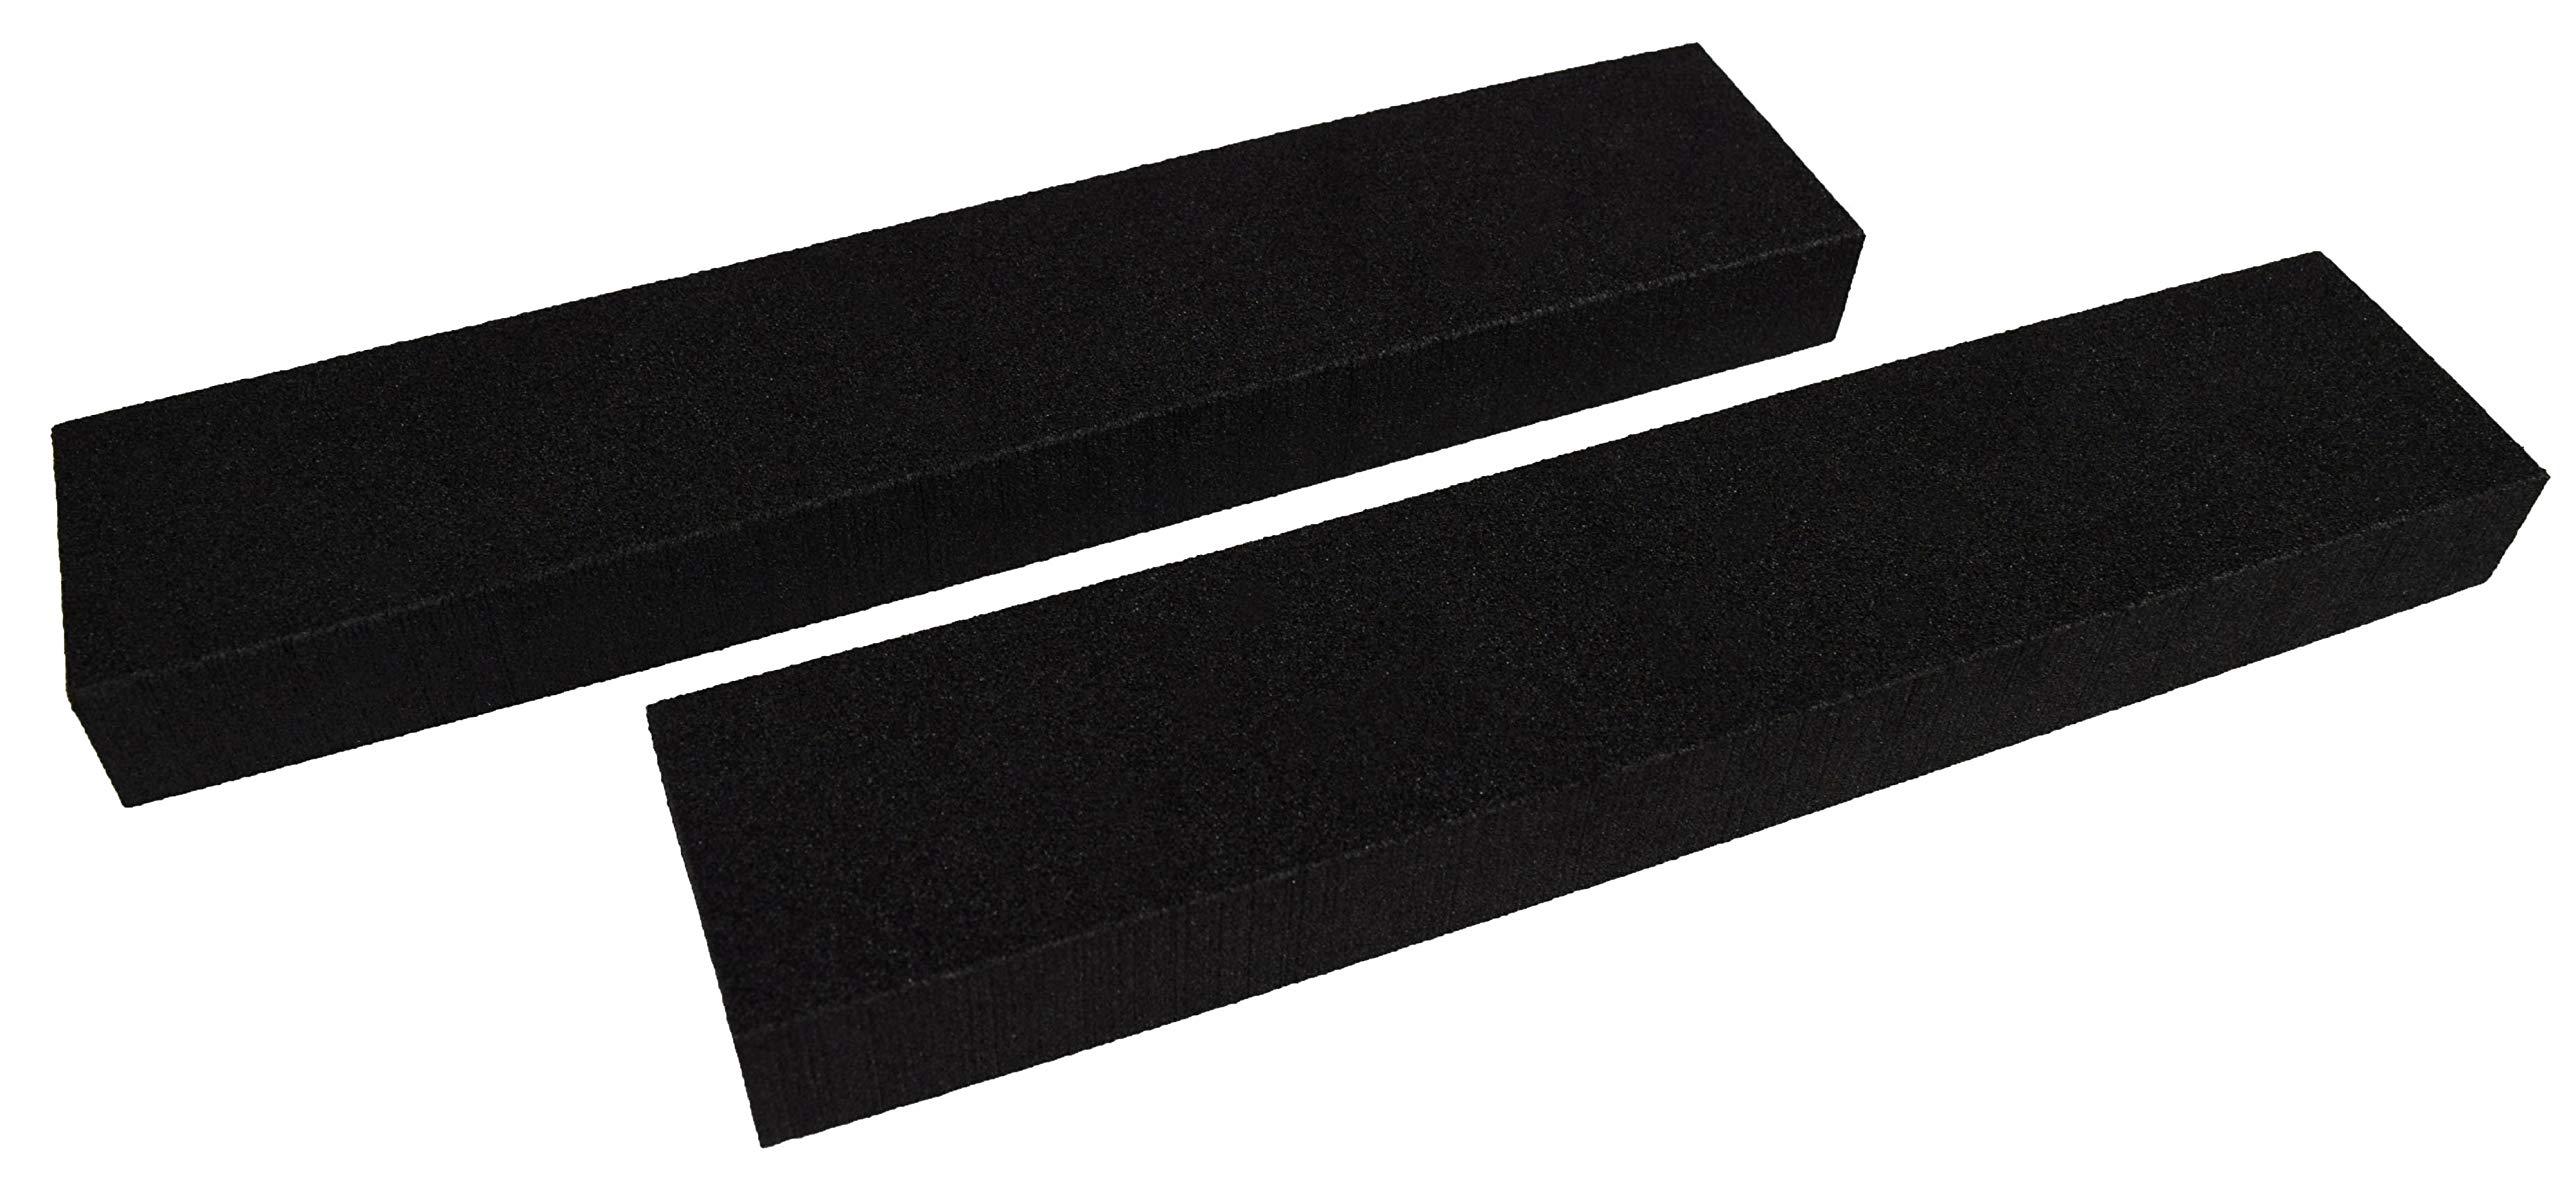 XCEL Power-Block Black Scruff Pad Sanding Block, Pack of 2, Size 11'' x 2'' x 1''